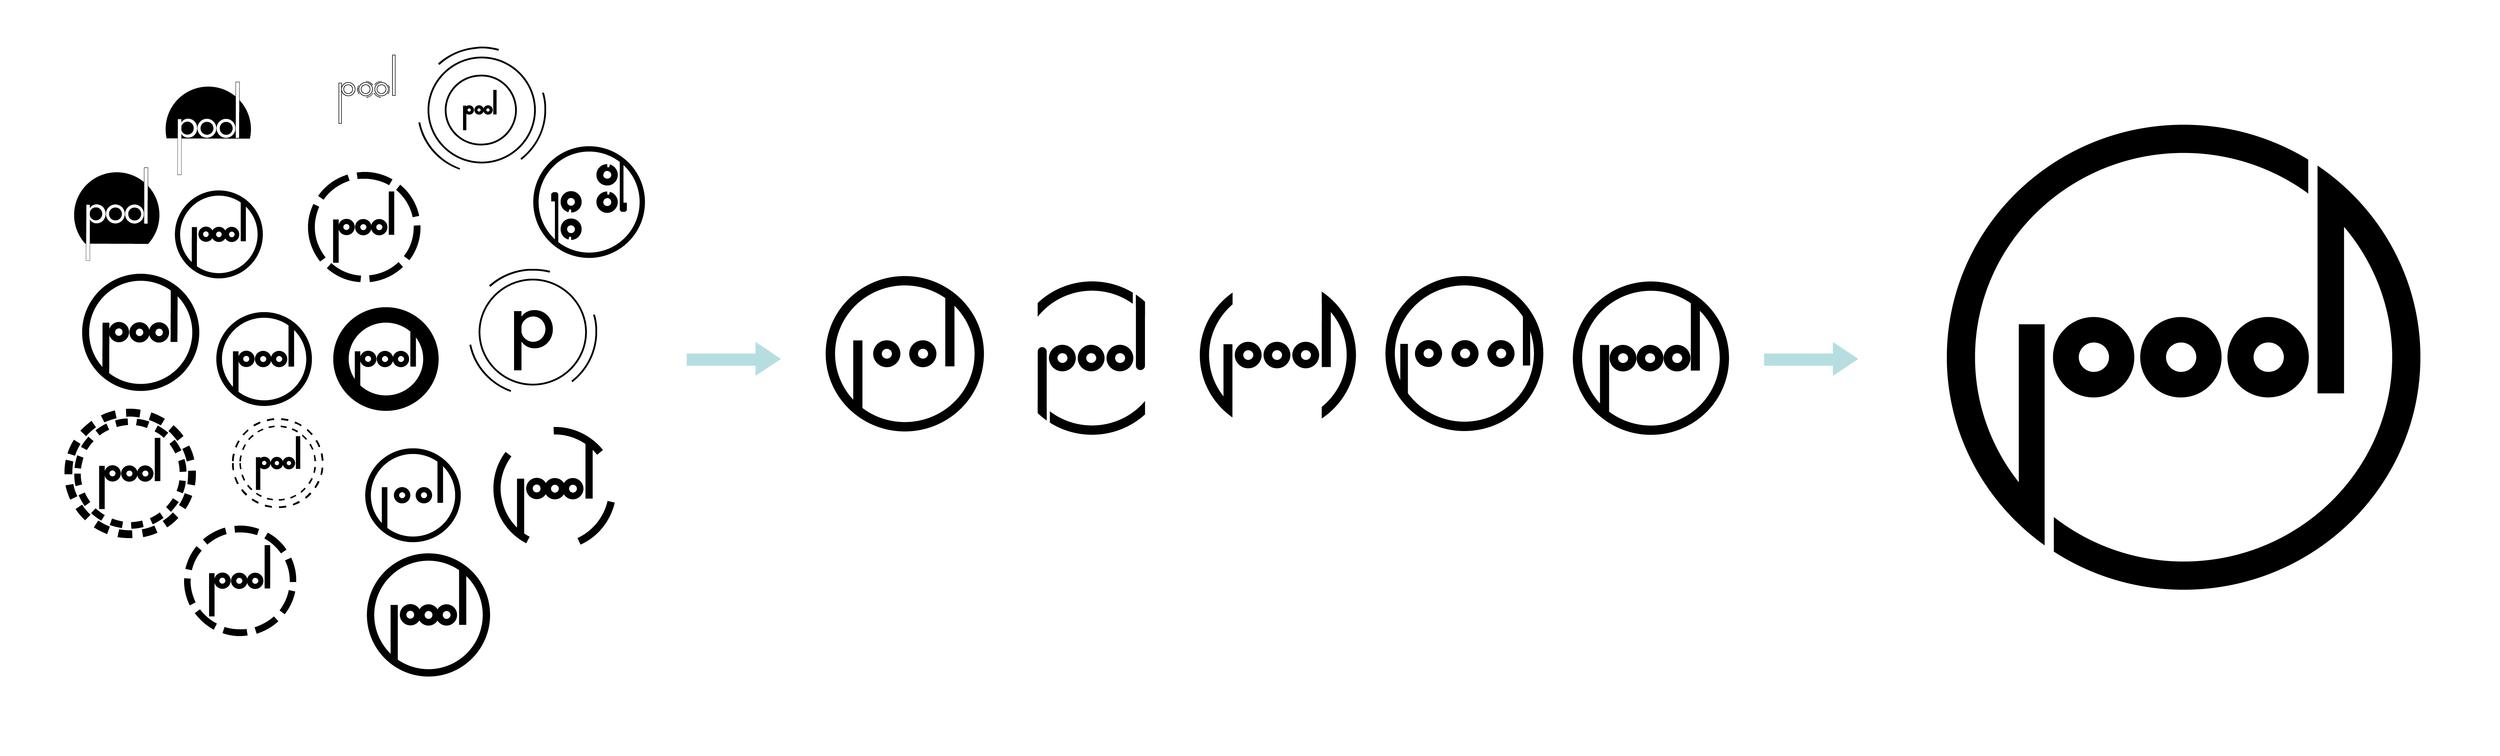 PoolLogoProcess-24.png